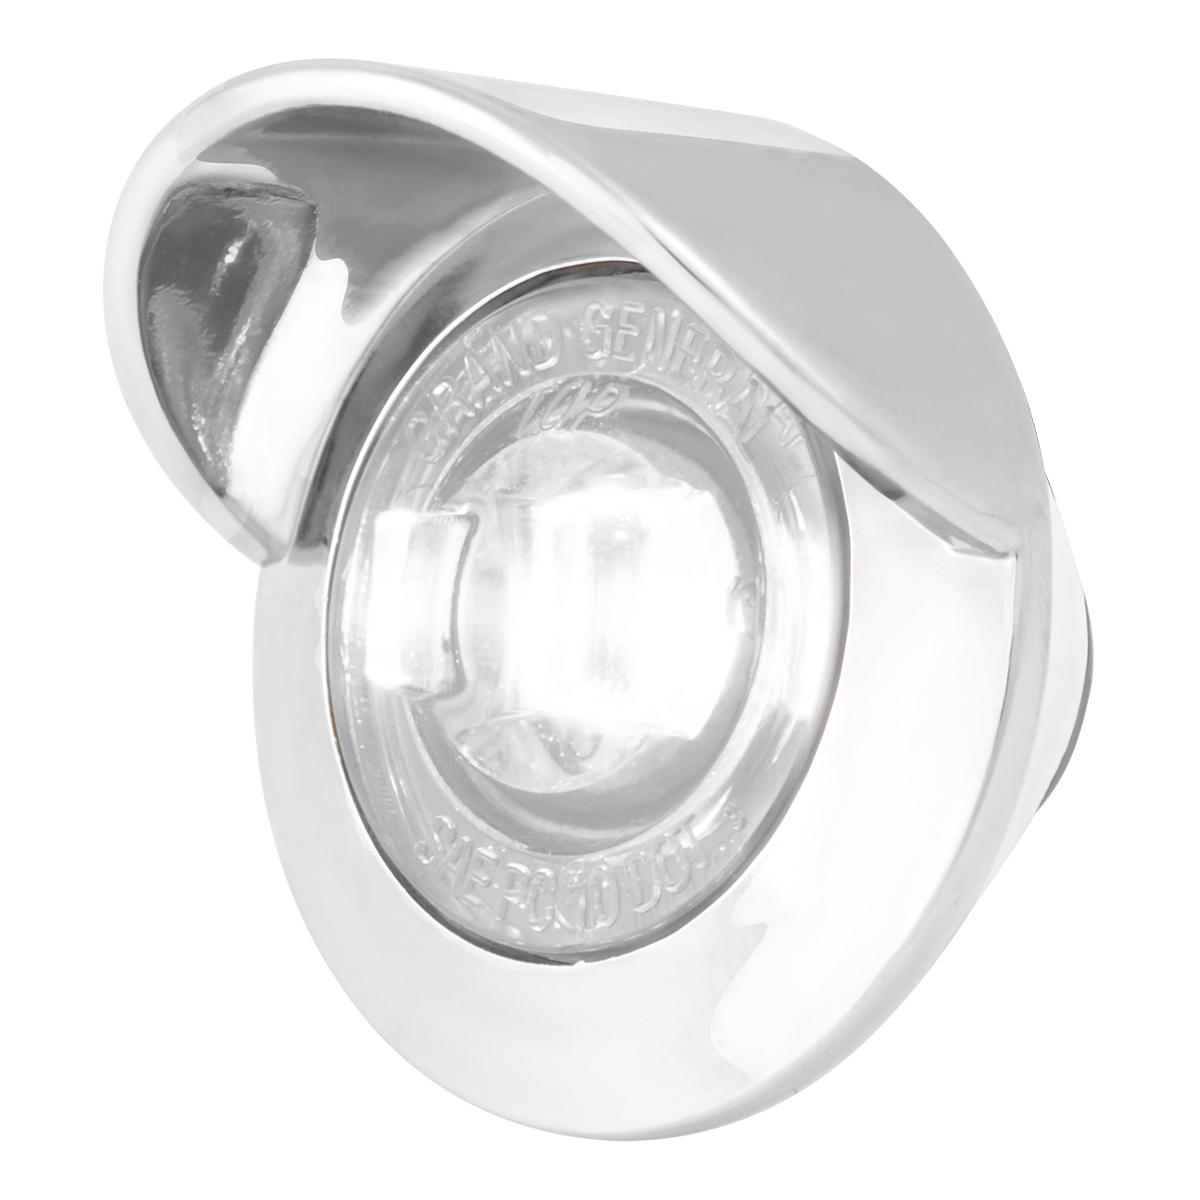 "75234 1-1/4"" Dia. Dual Function LED Light with Chrome Plastic Bezel w/ Visor and Nut"